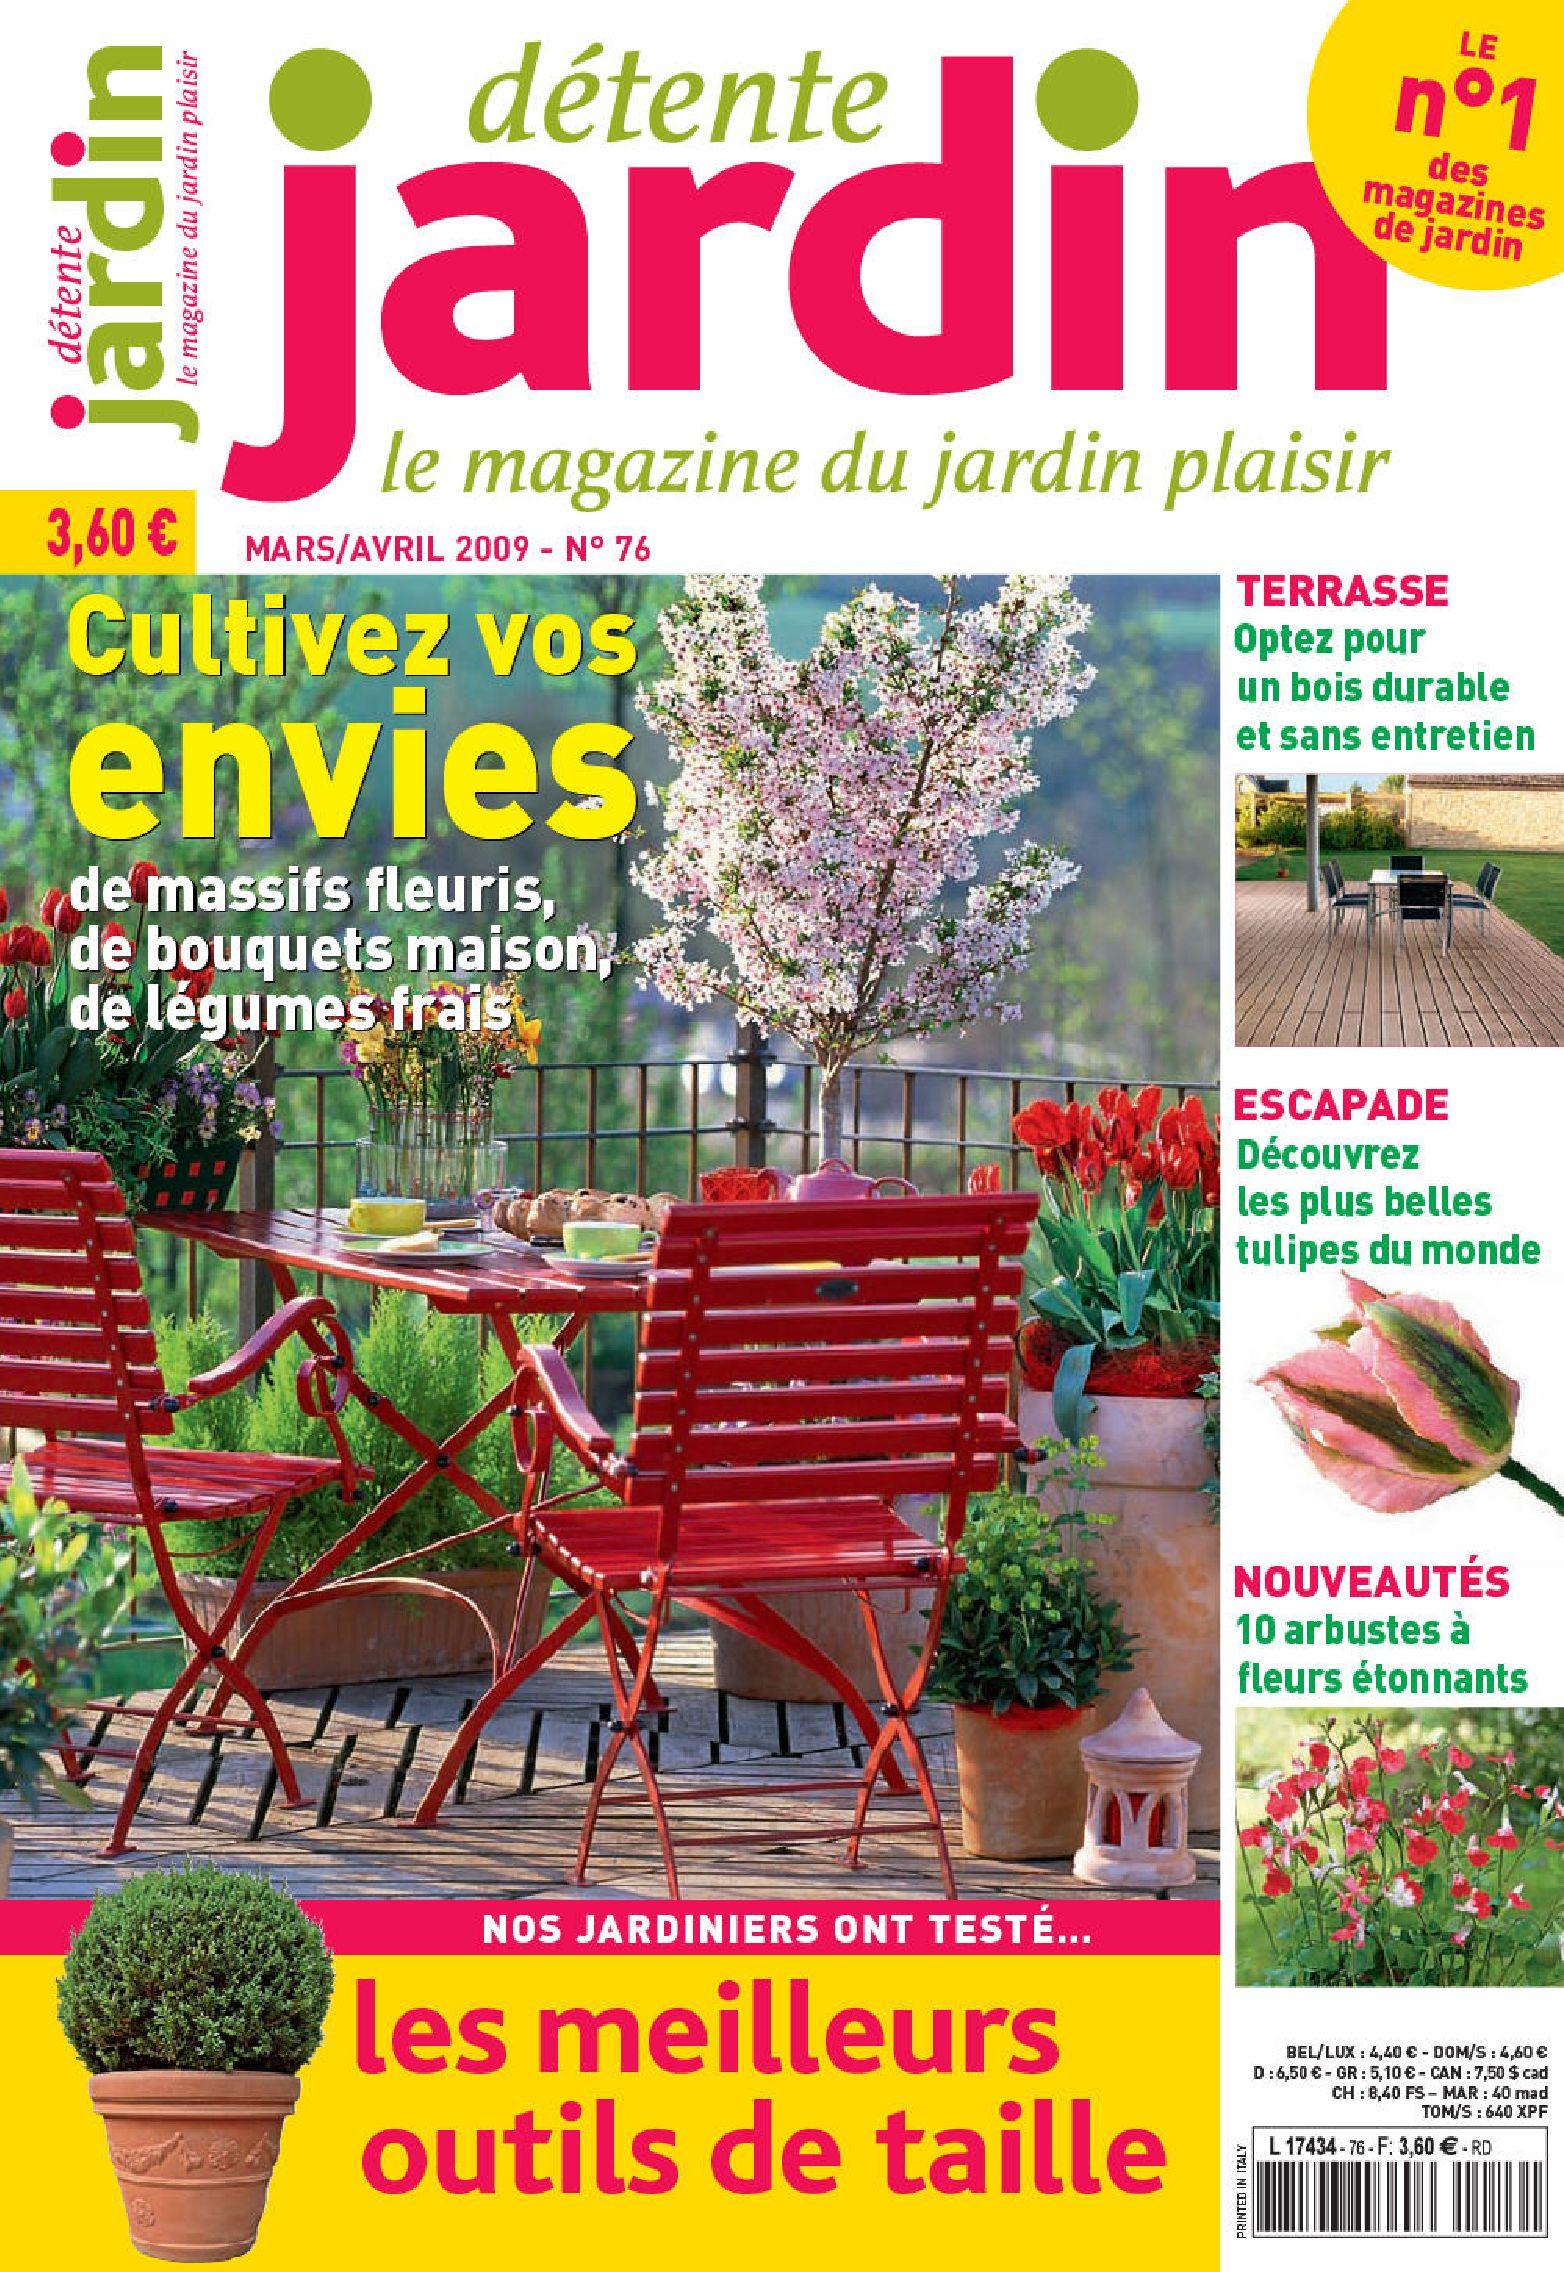 Detente.jardin.n73.french.mag-Eland By Ebooks Land - Issuu concernant Détente Jardin Magazine